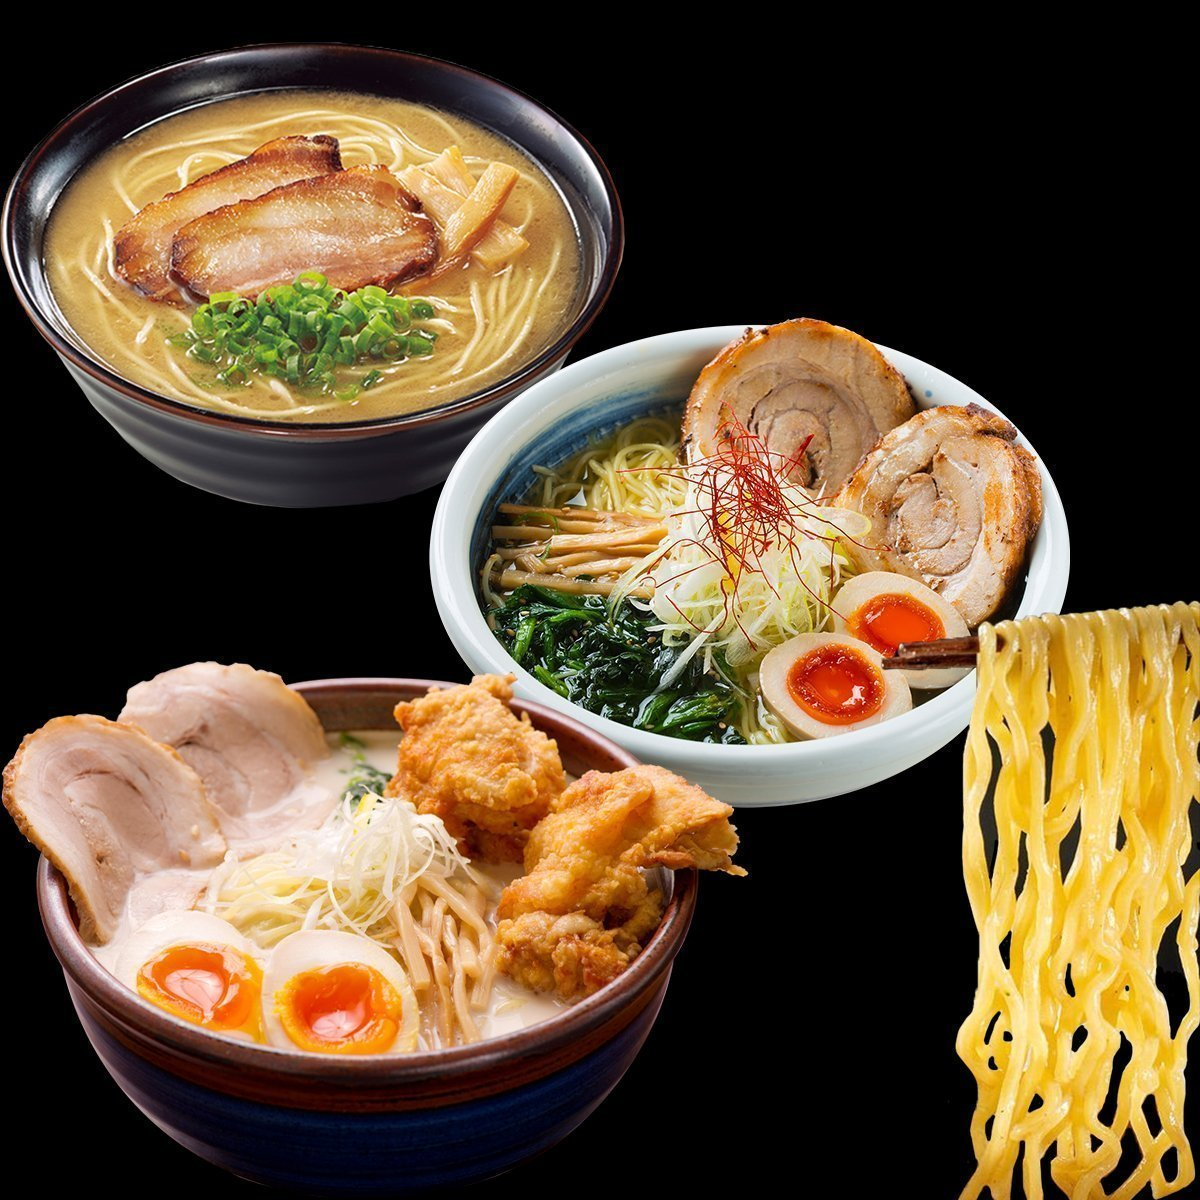 Frozen Ramen from Hokkaido (5pcs) 200g / 北海道・西山製麺の熟成麺 冷凍麺 ラーメン